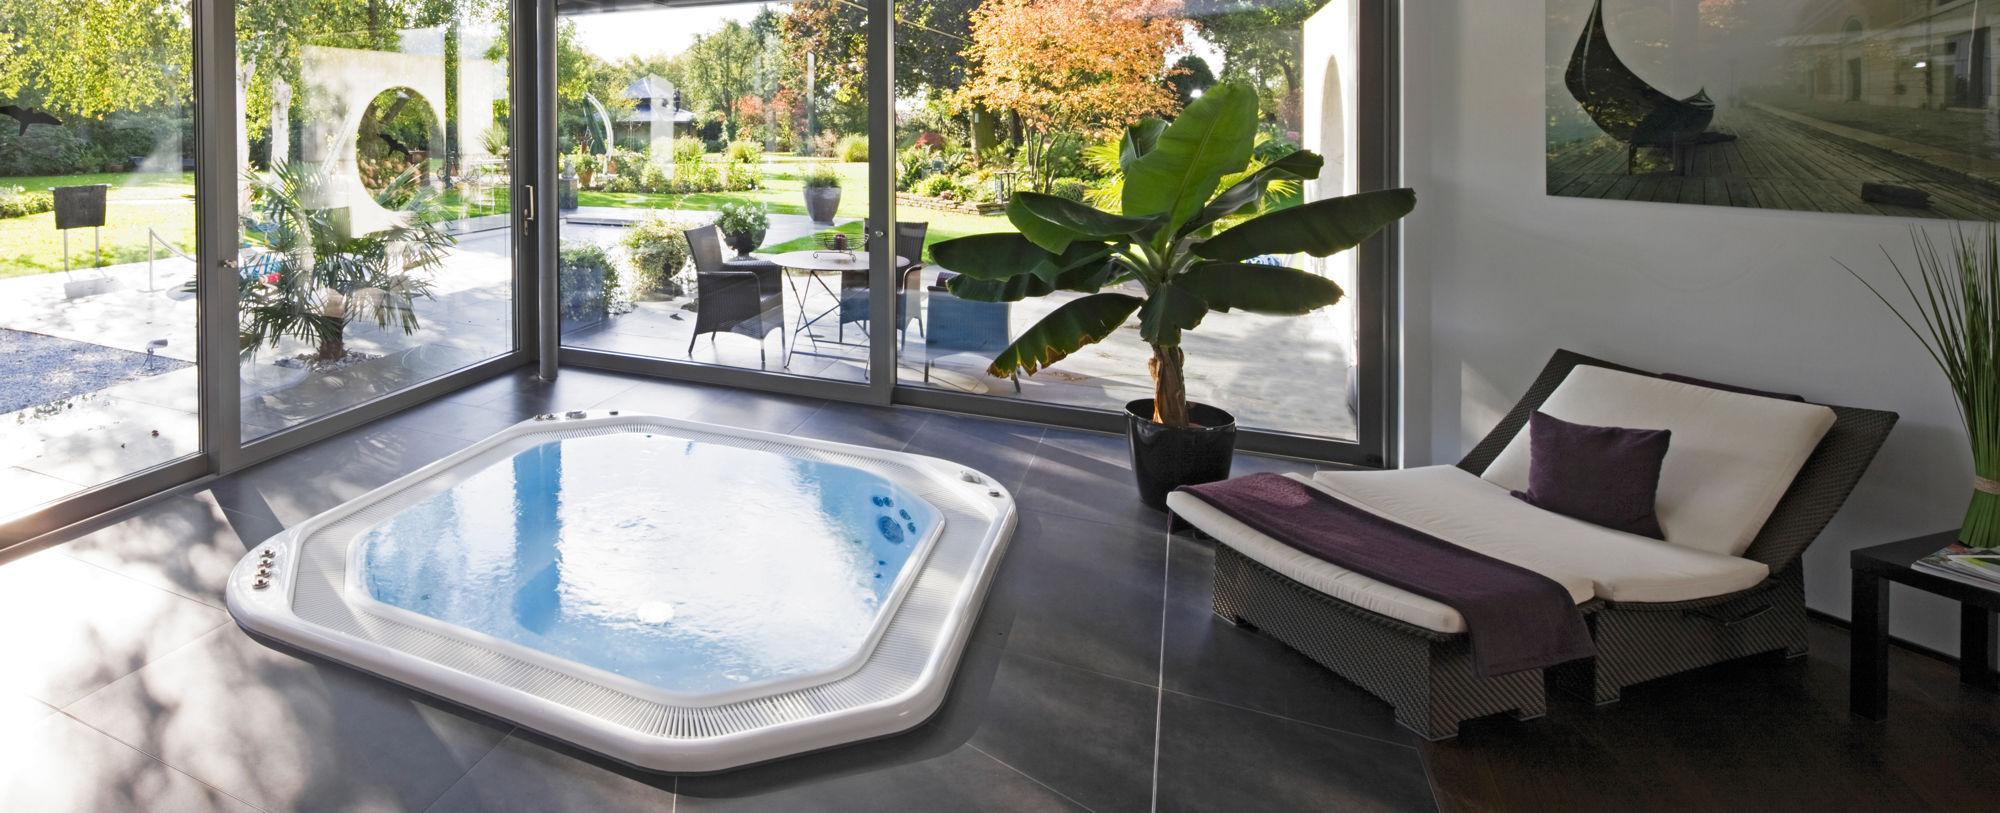 indoor whirlpools. Black Bedroom Furniture Sets. Home Design Ideas